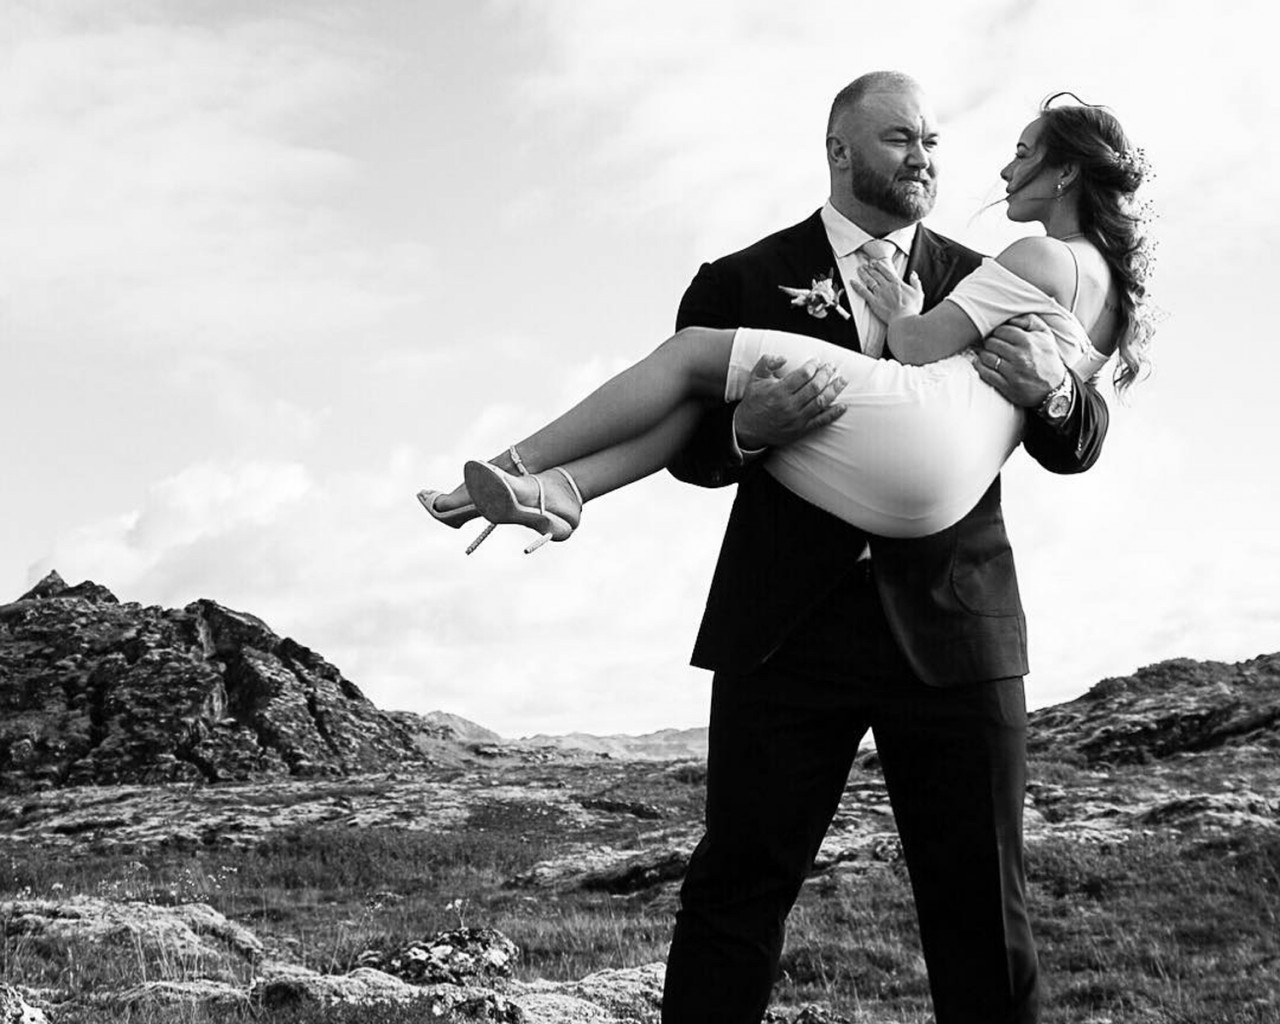 Как разница в росте влияет на благополучие в браке